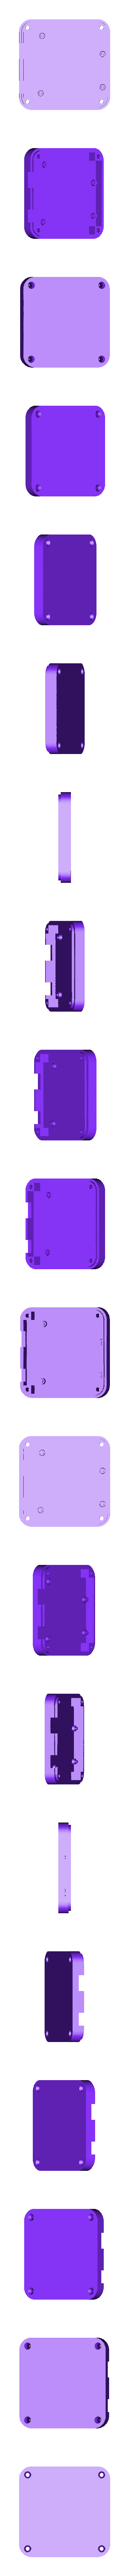 uno_case_base.stl Download free STL file 3D Printed Case for Arduino Uno, Leonardo. • 3D printing model, Lassaalk